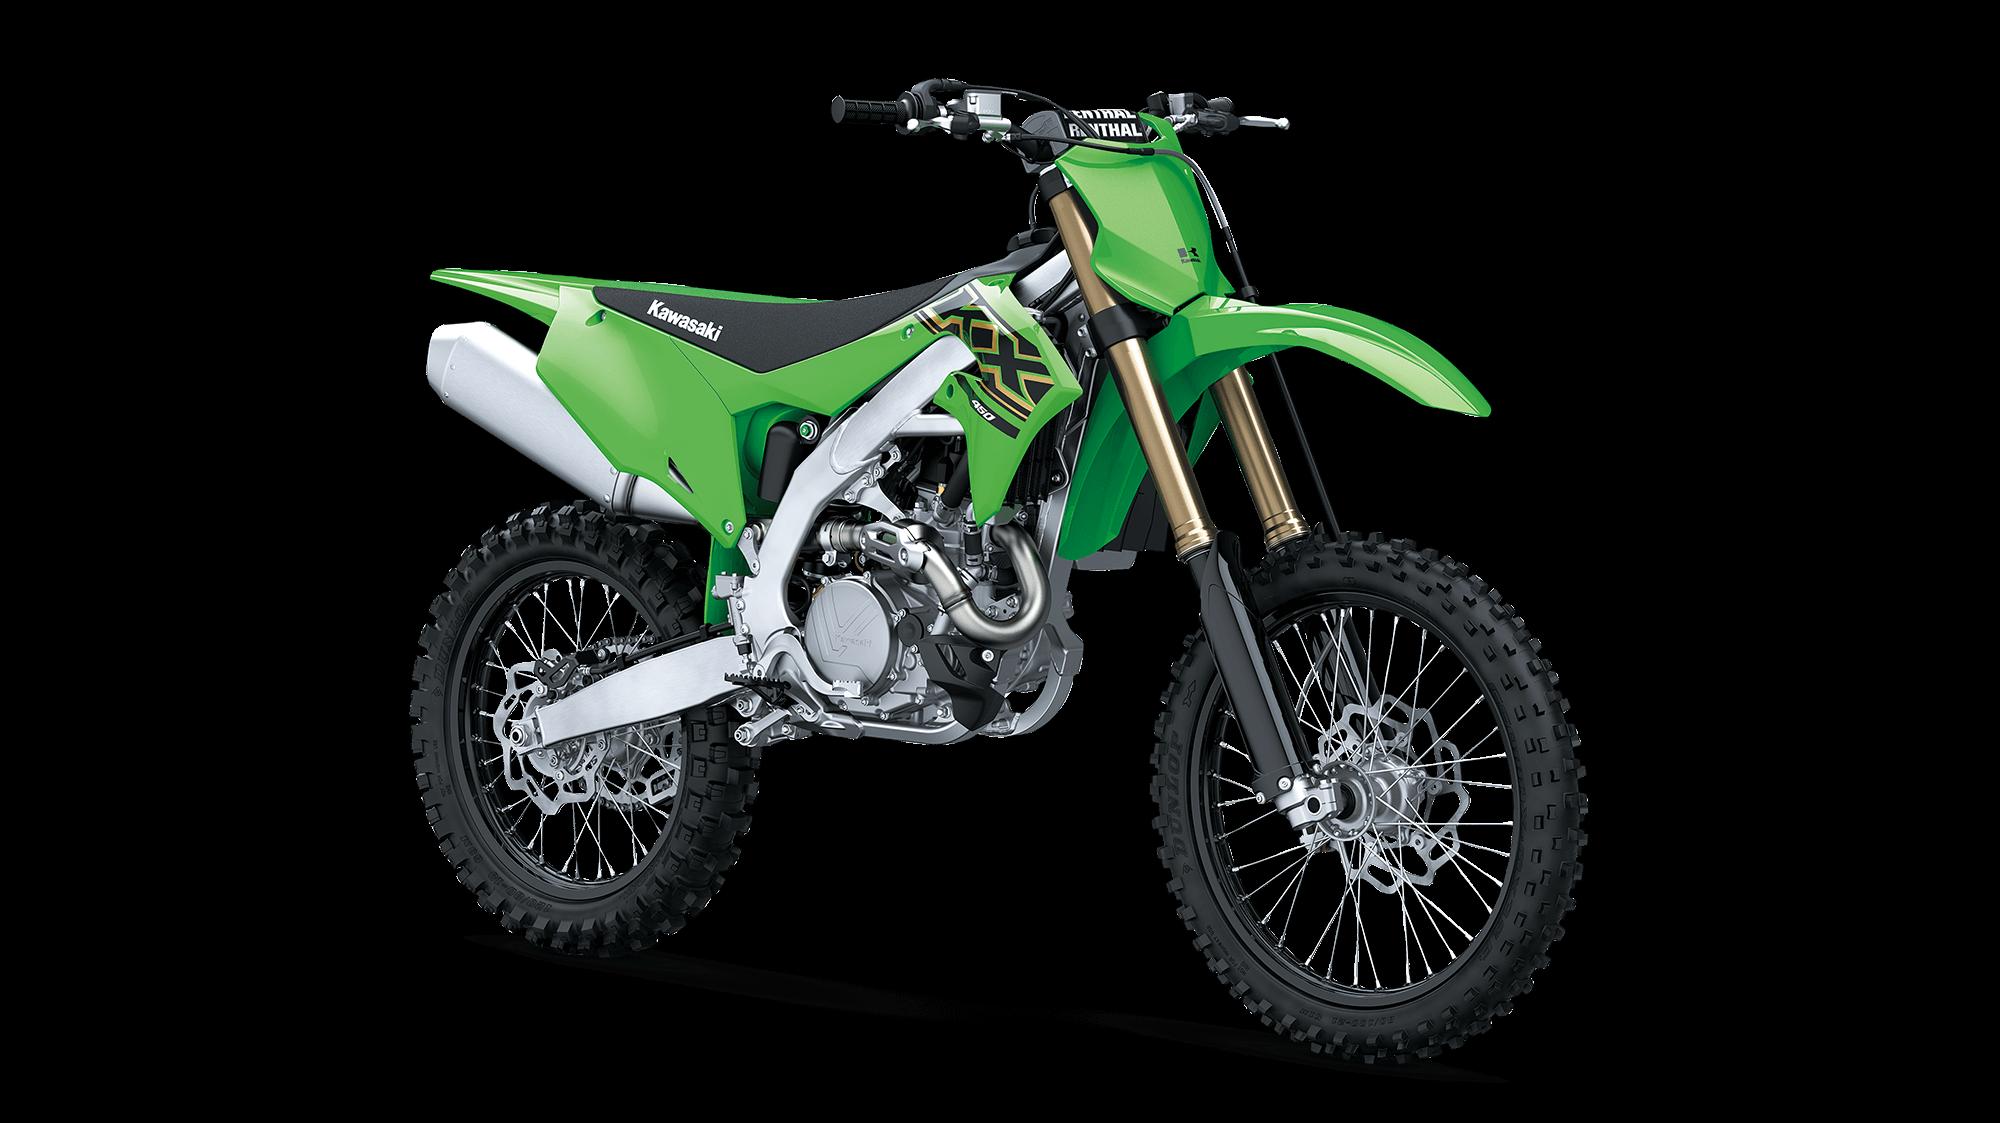 KX ™ 450